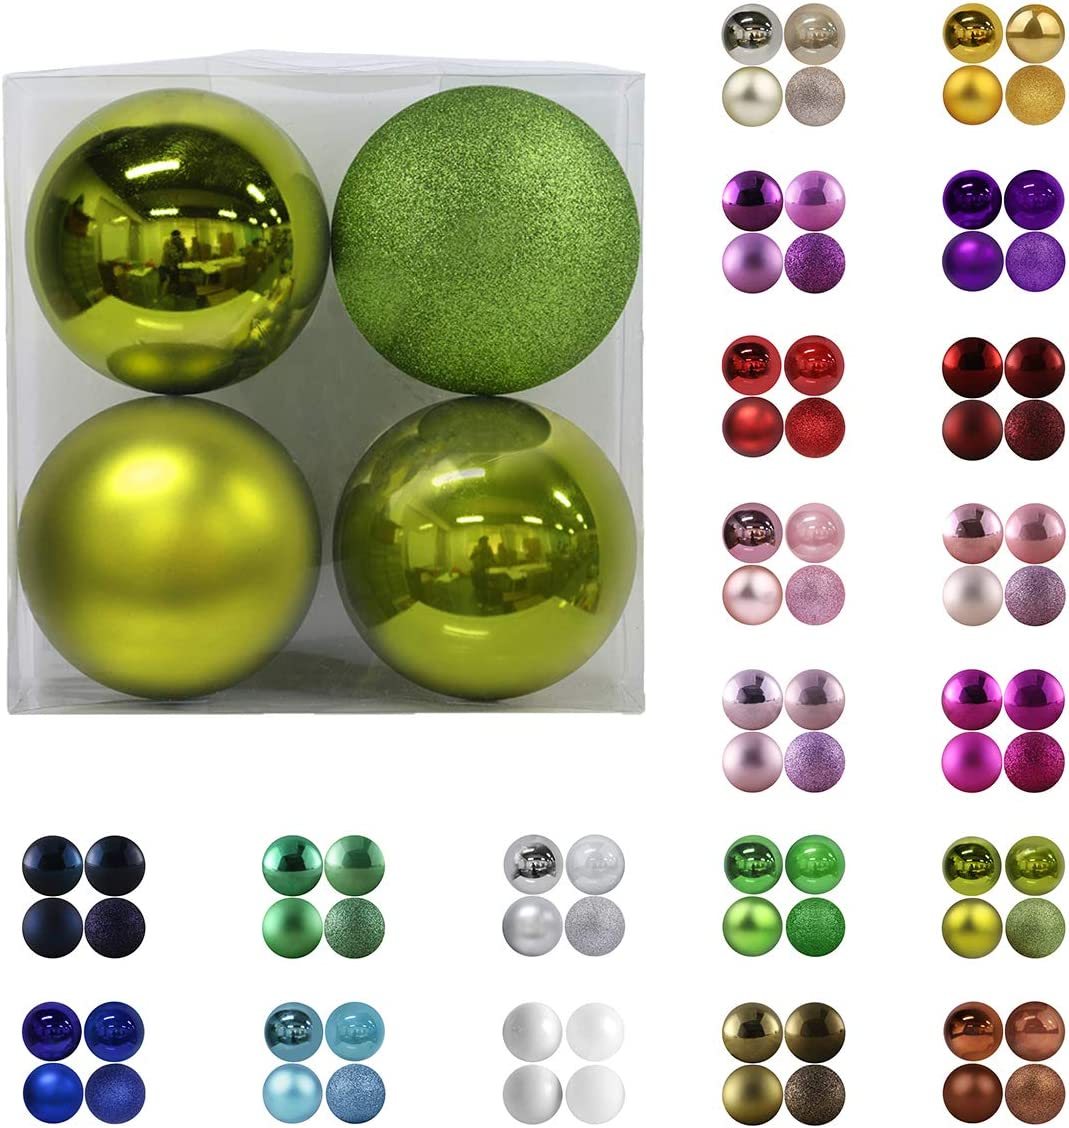 "Christmas Balls Ornaments for Xmas Tree - Shatterproof Christmas Tree Decorations Large Hanging Ball Lemon Green 4.0"" x 4 Pack"